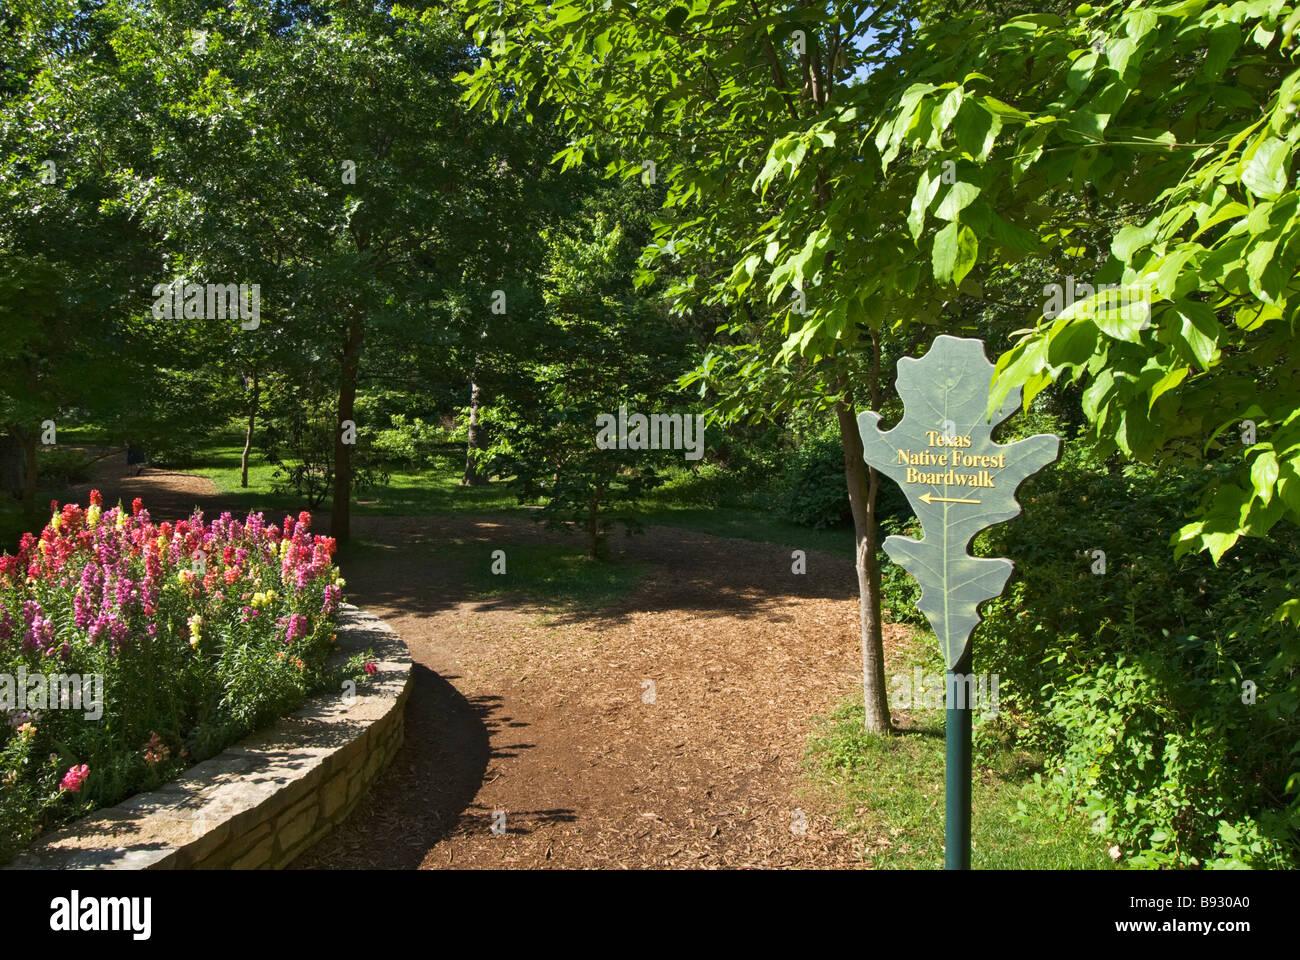 Texas Fort Worth Botanic Garden Native Forest Boardwalk Sign